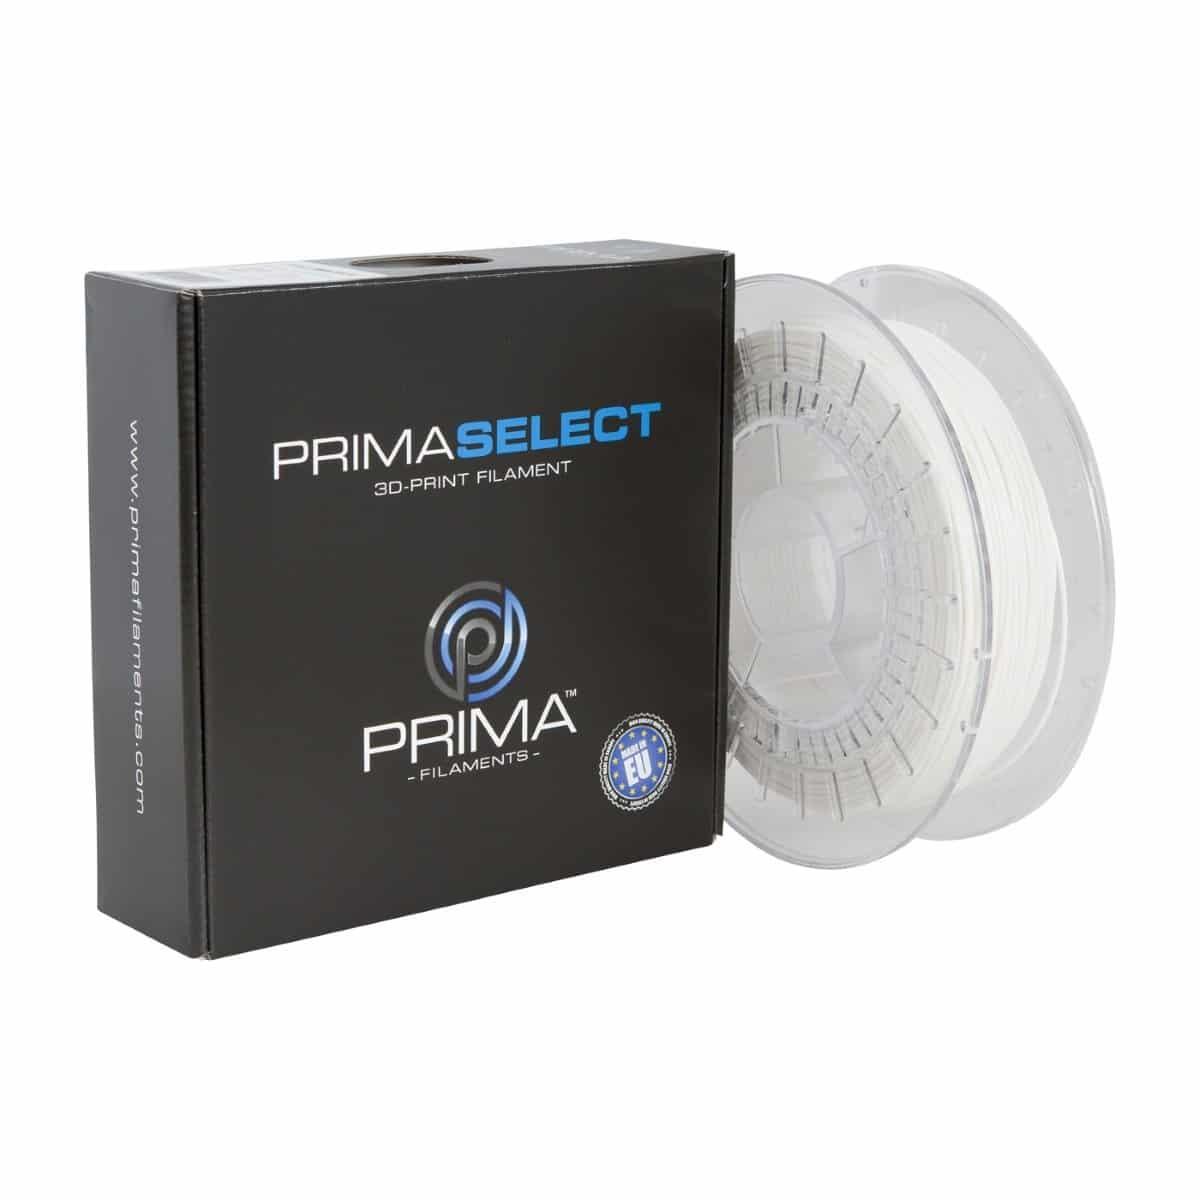 Image of PrimaSelect FLEX - 1.75mm - 500 g - White